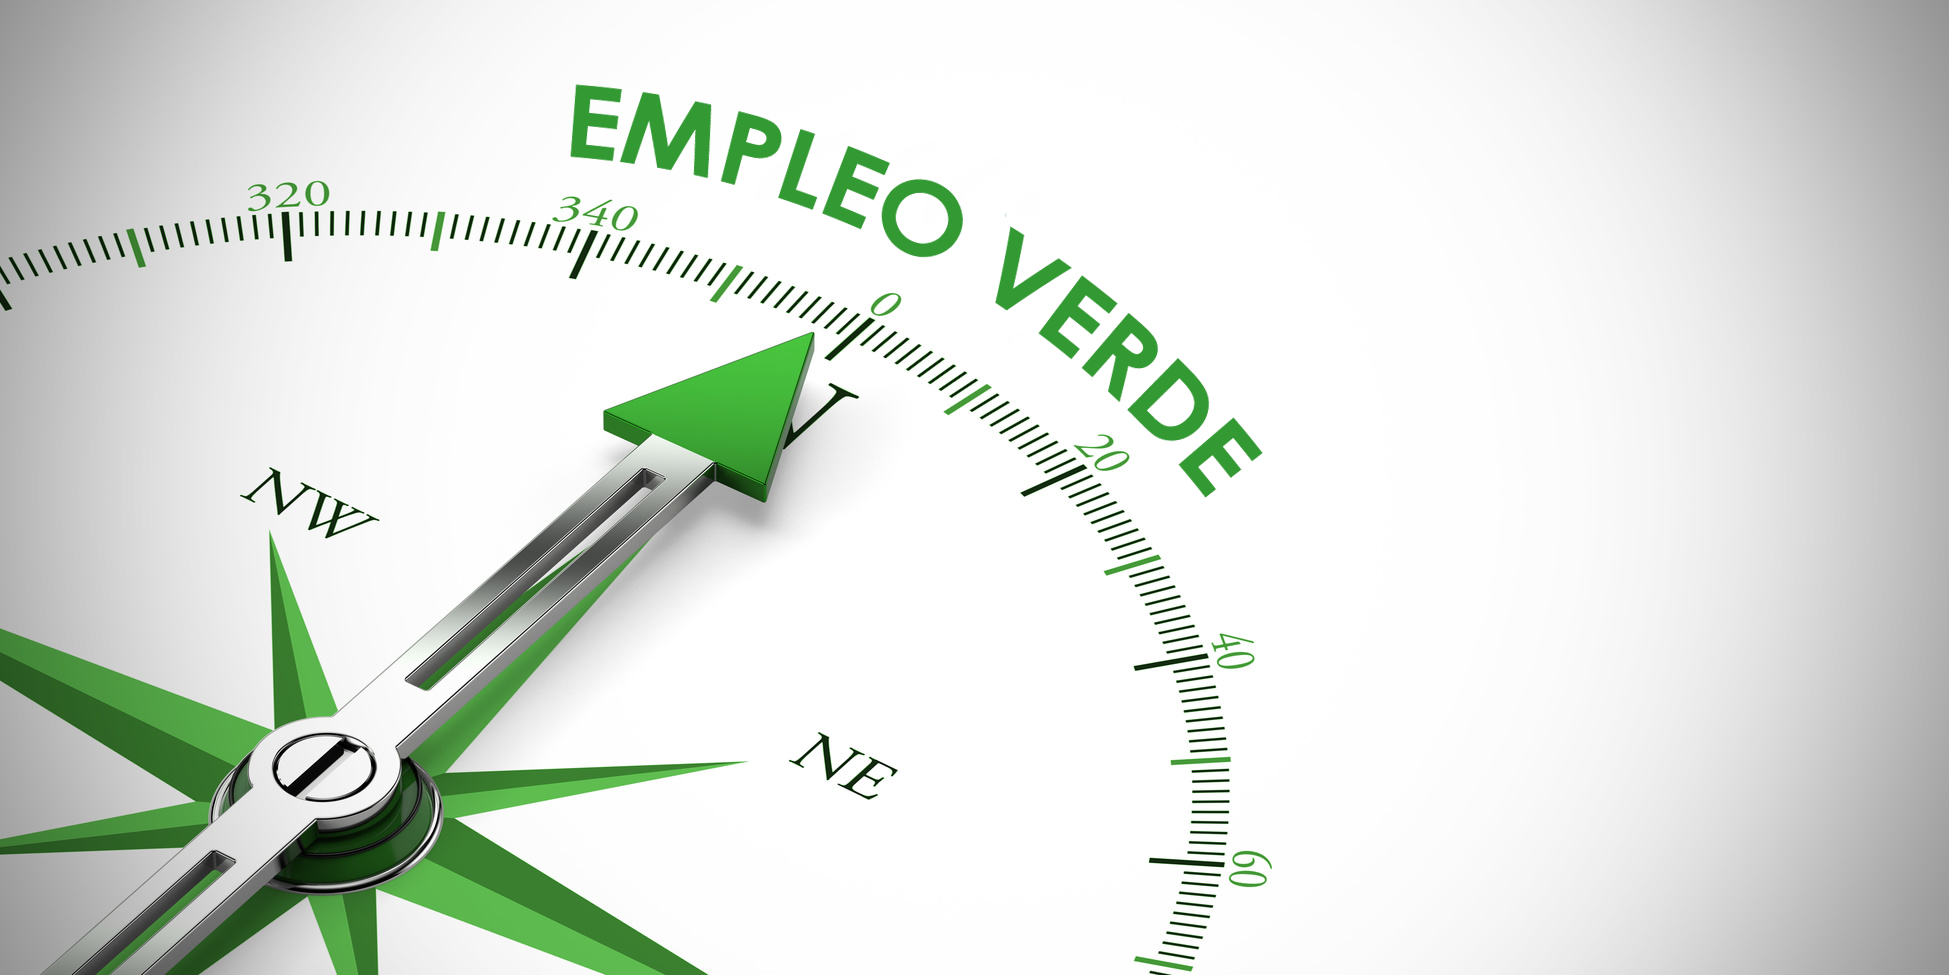 empleo-verde-copia